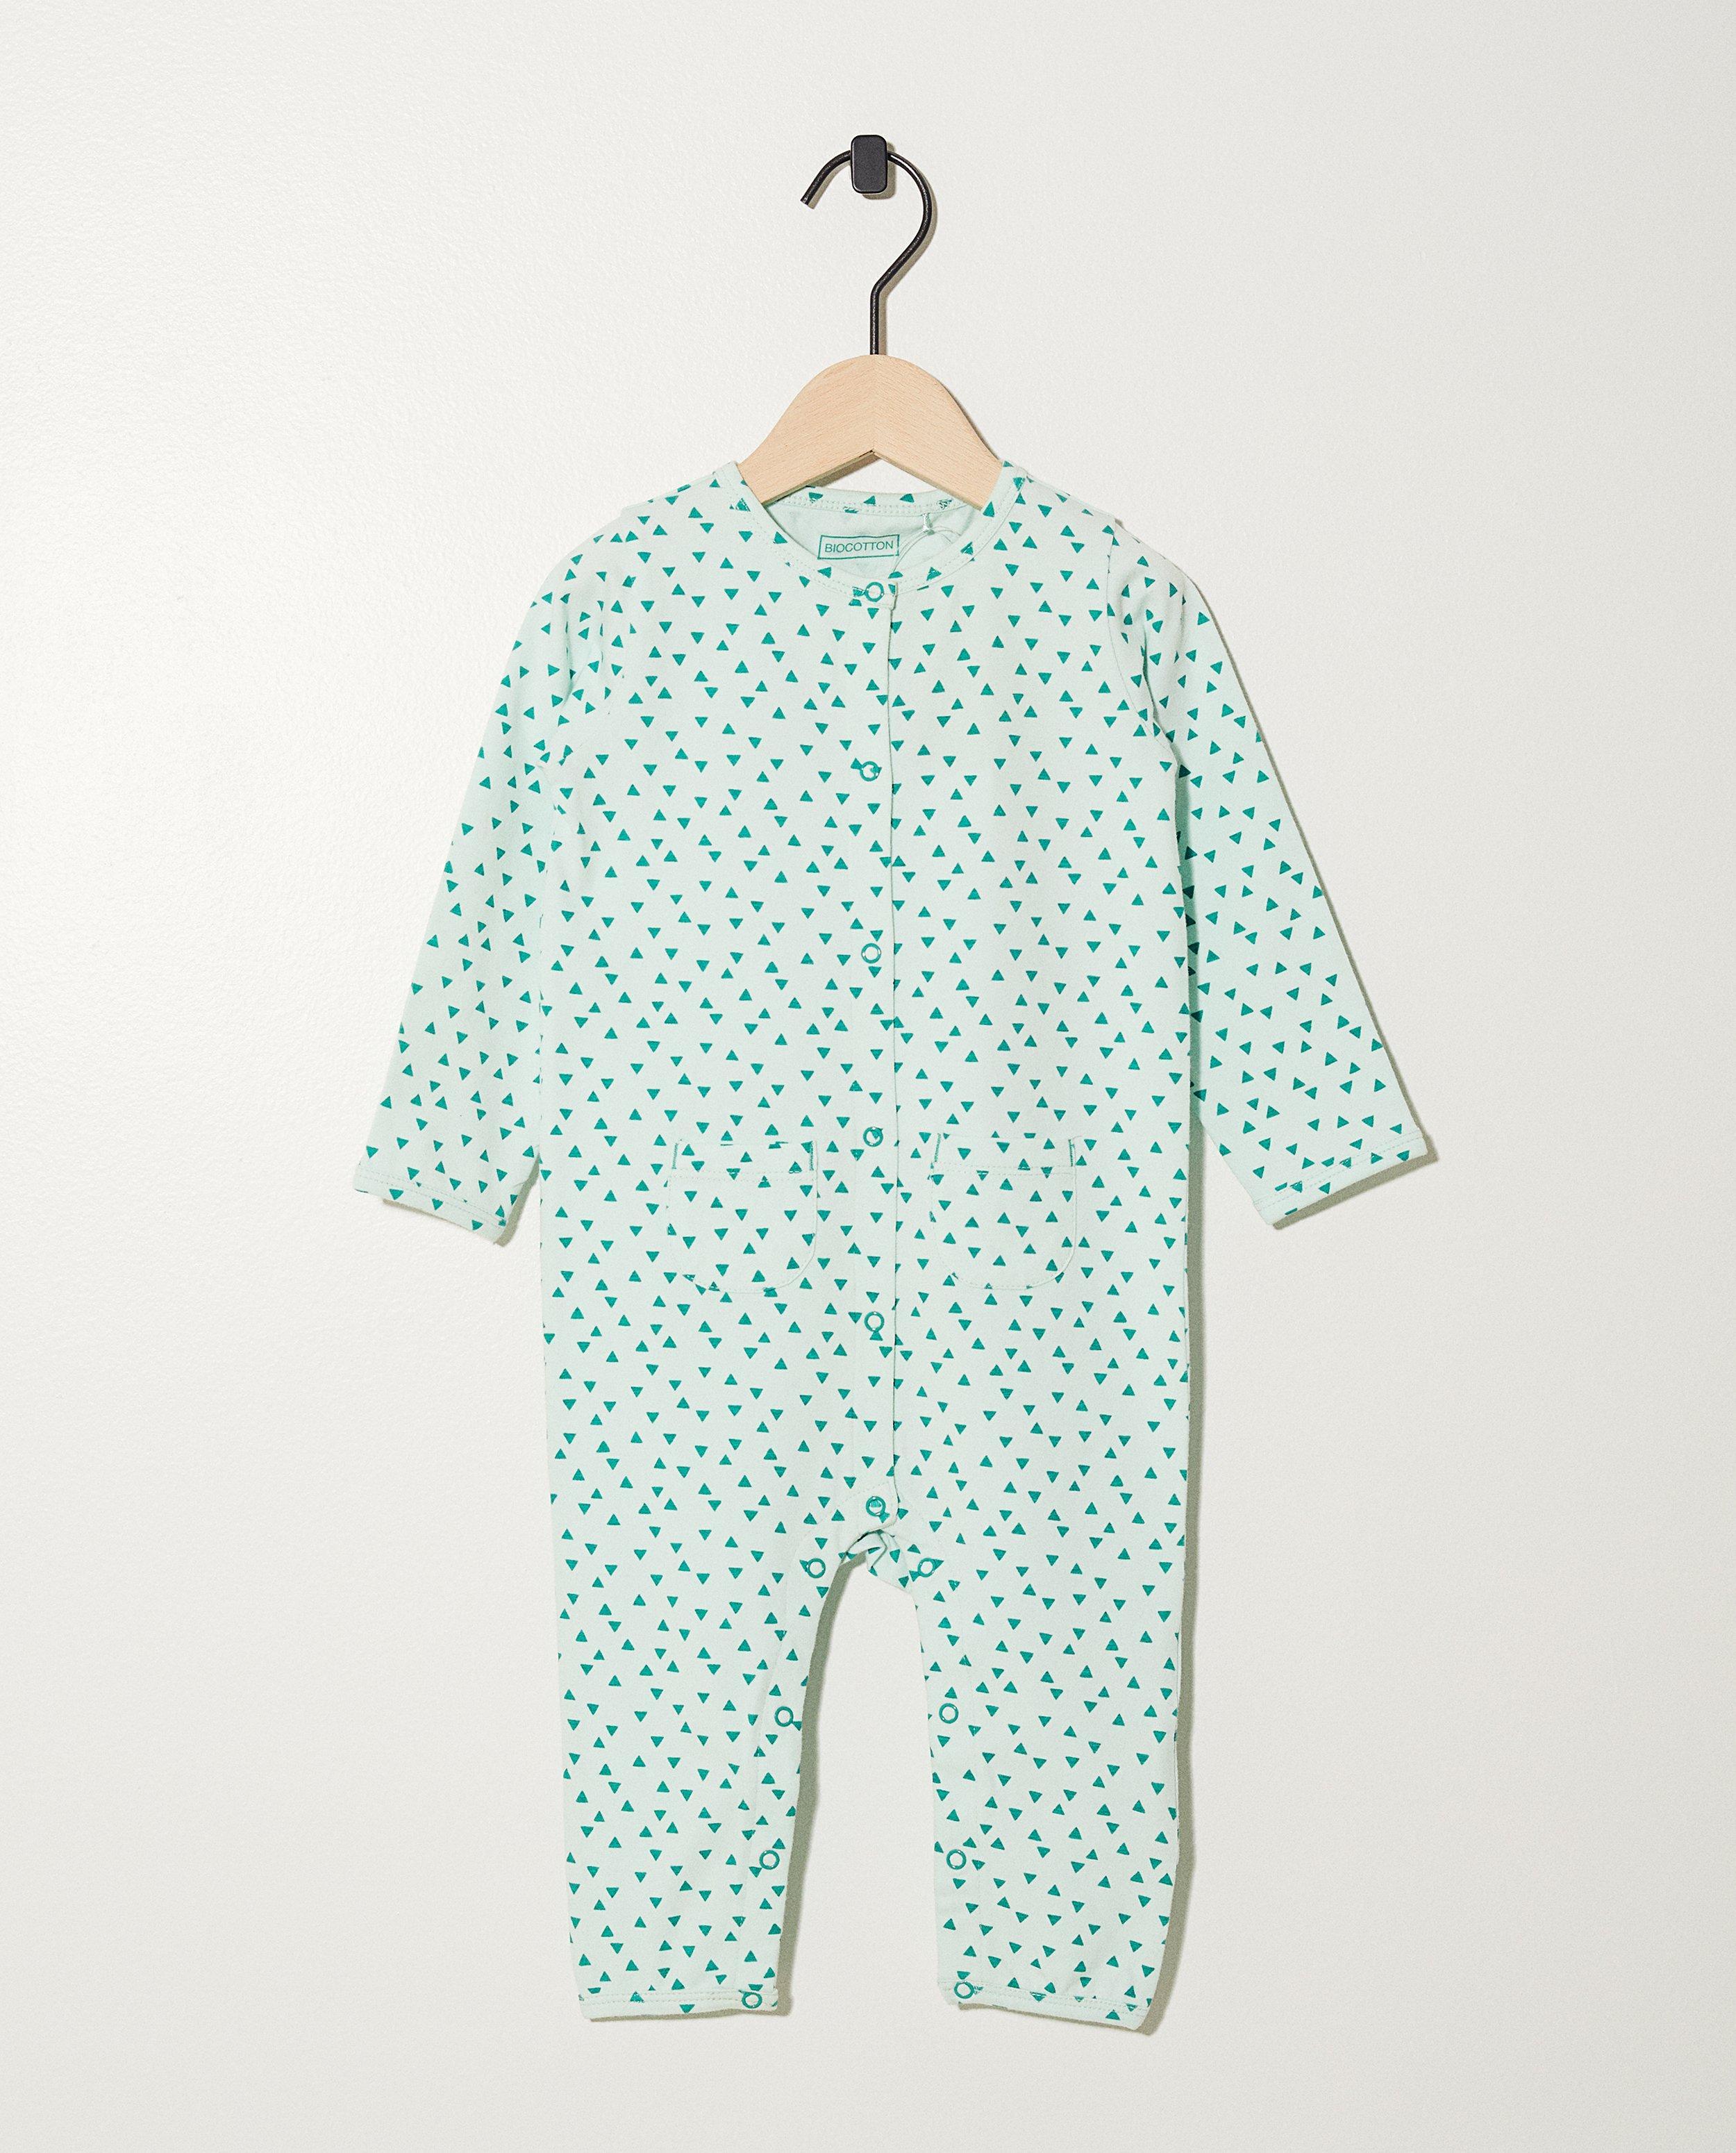 8d4ade0258421 Pyjama vert pâle en coton bio imprimé intégral